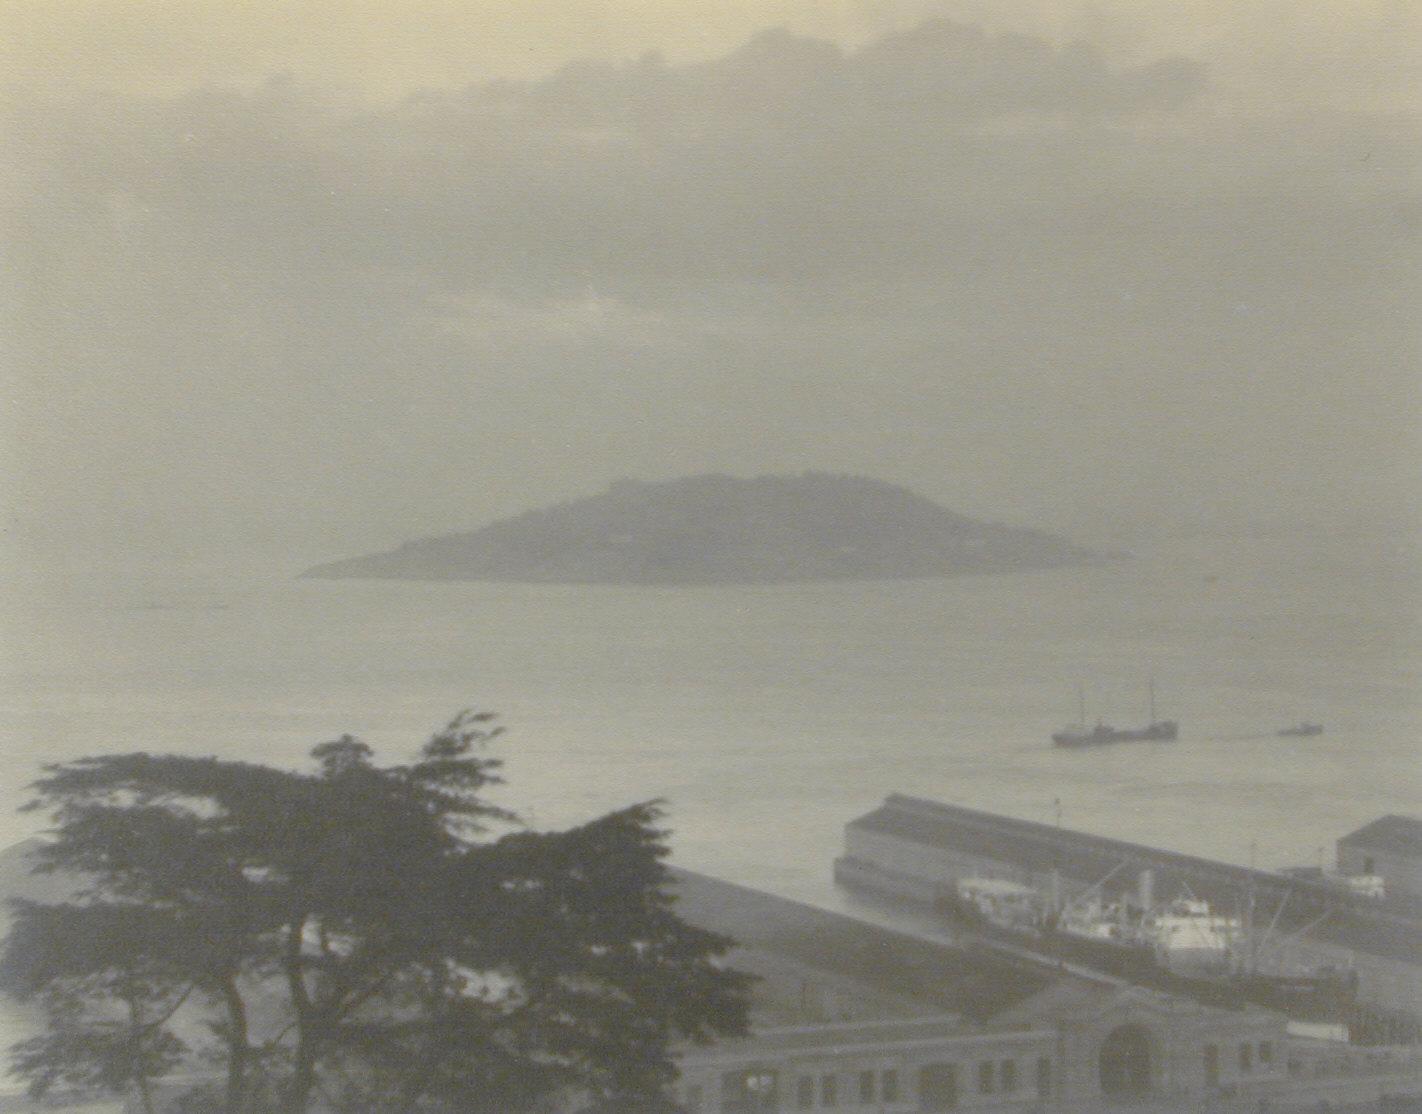 View of Treasure Island